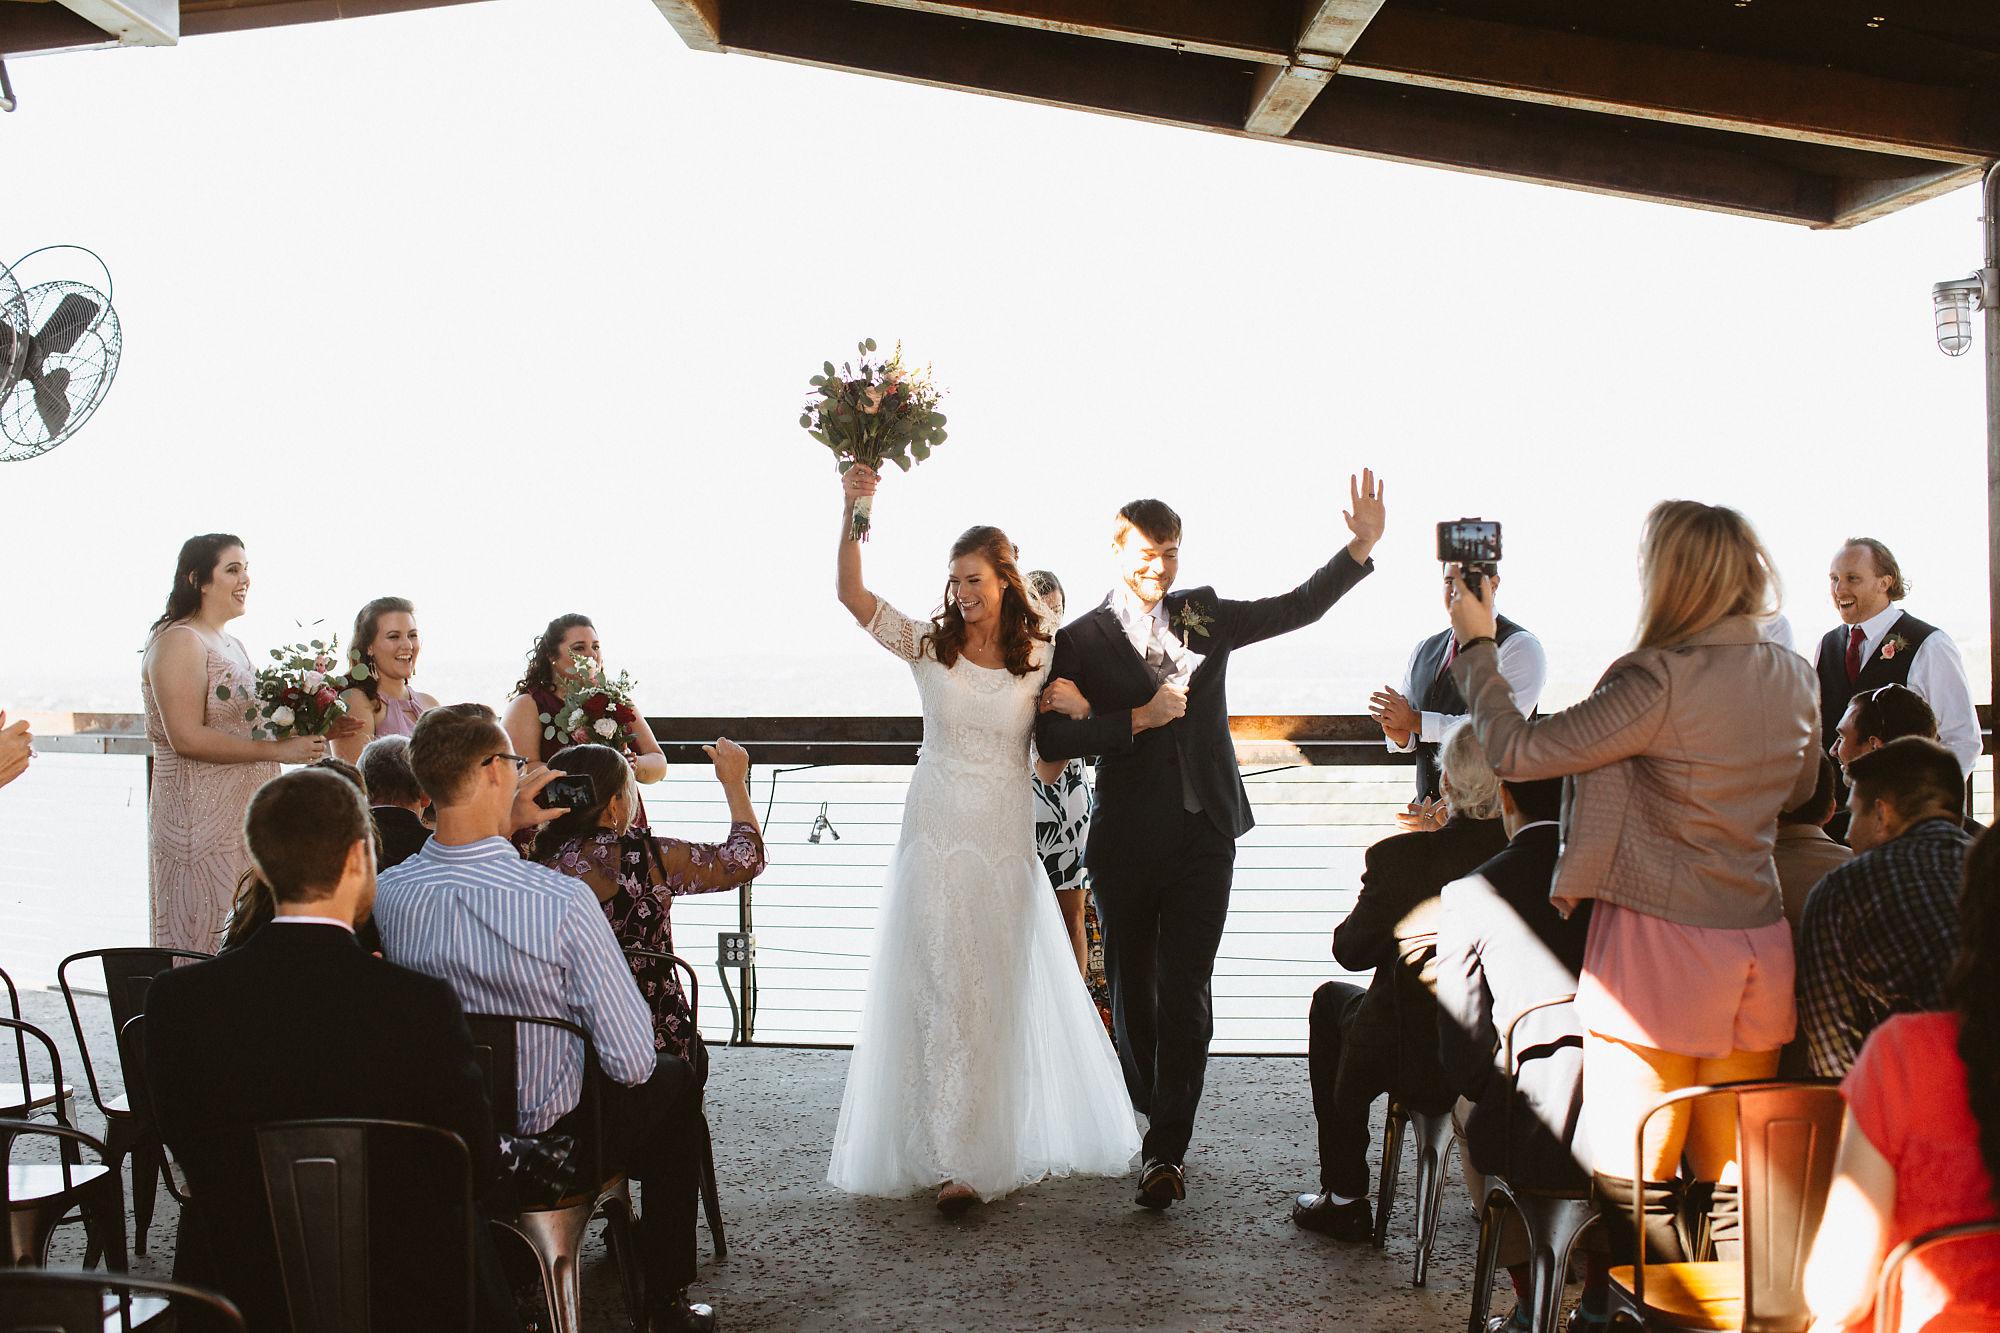 jessica_austin_oasis_brewery_wedding_photos124523.jpg